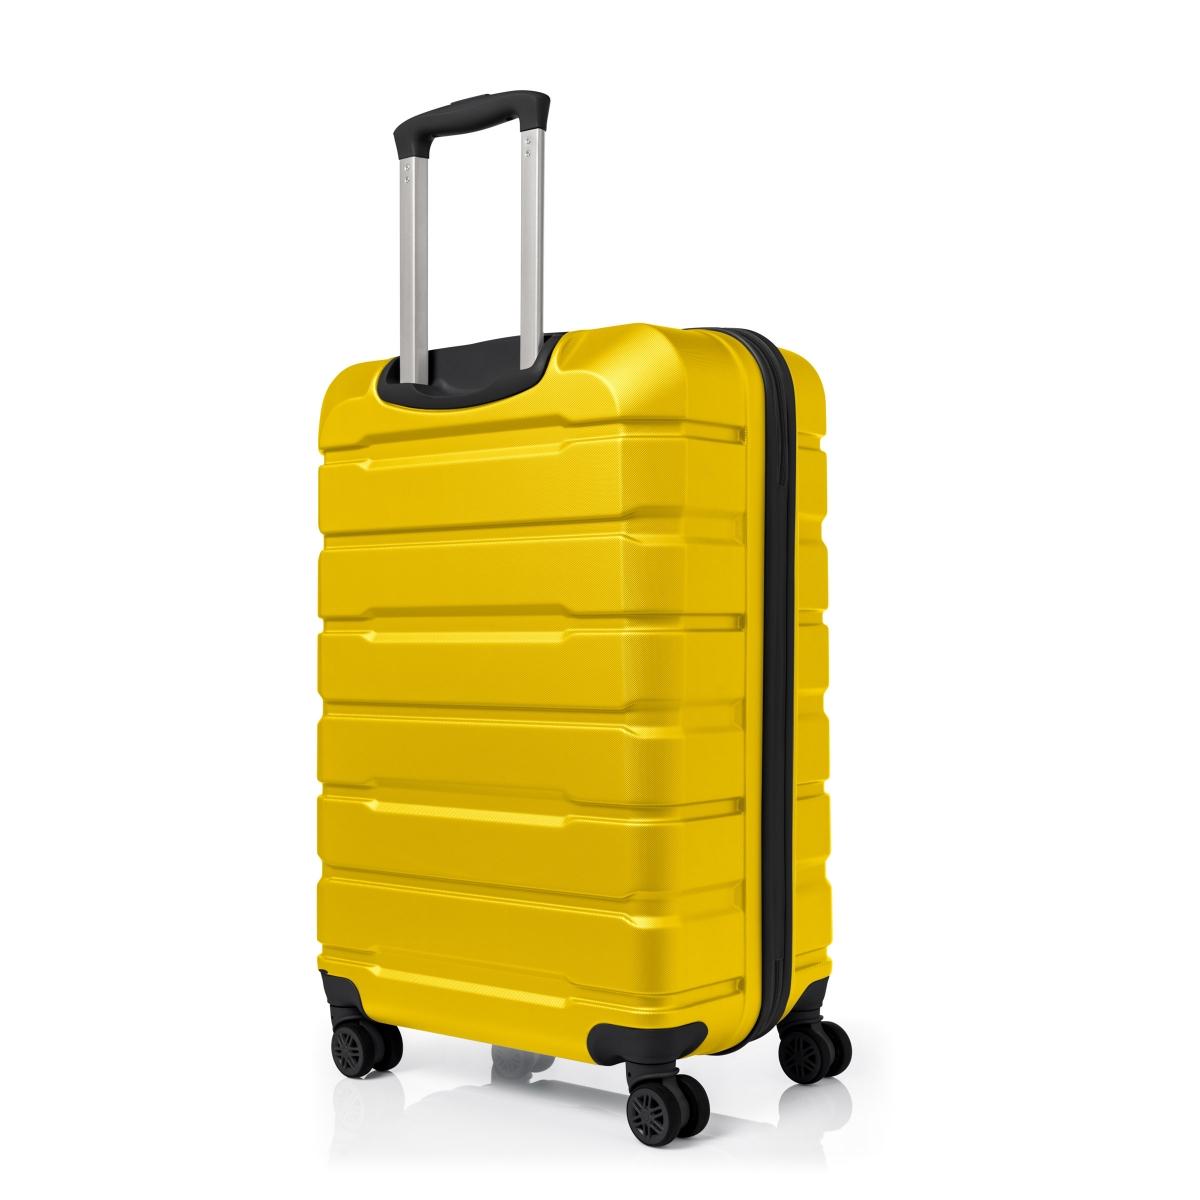 Gedox Abs Premium Tonaton 3'lü Valiz Seyahat Seti - Model:500.12 Sarı